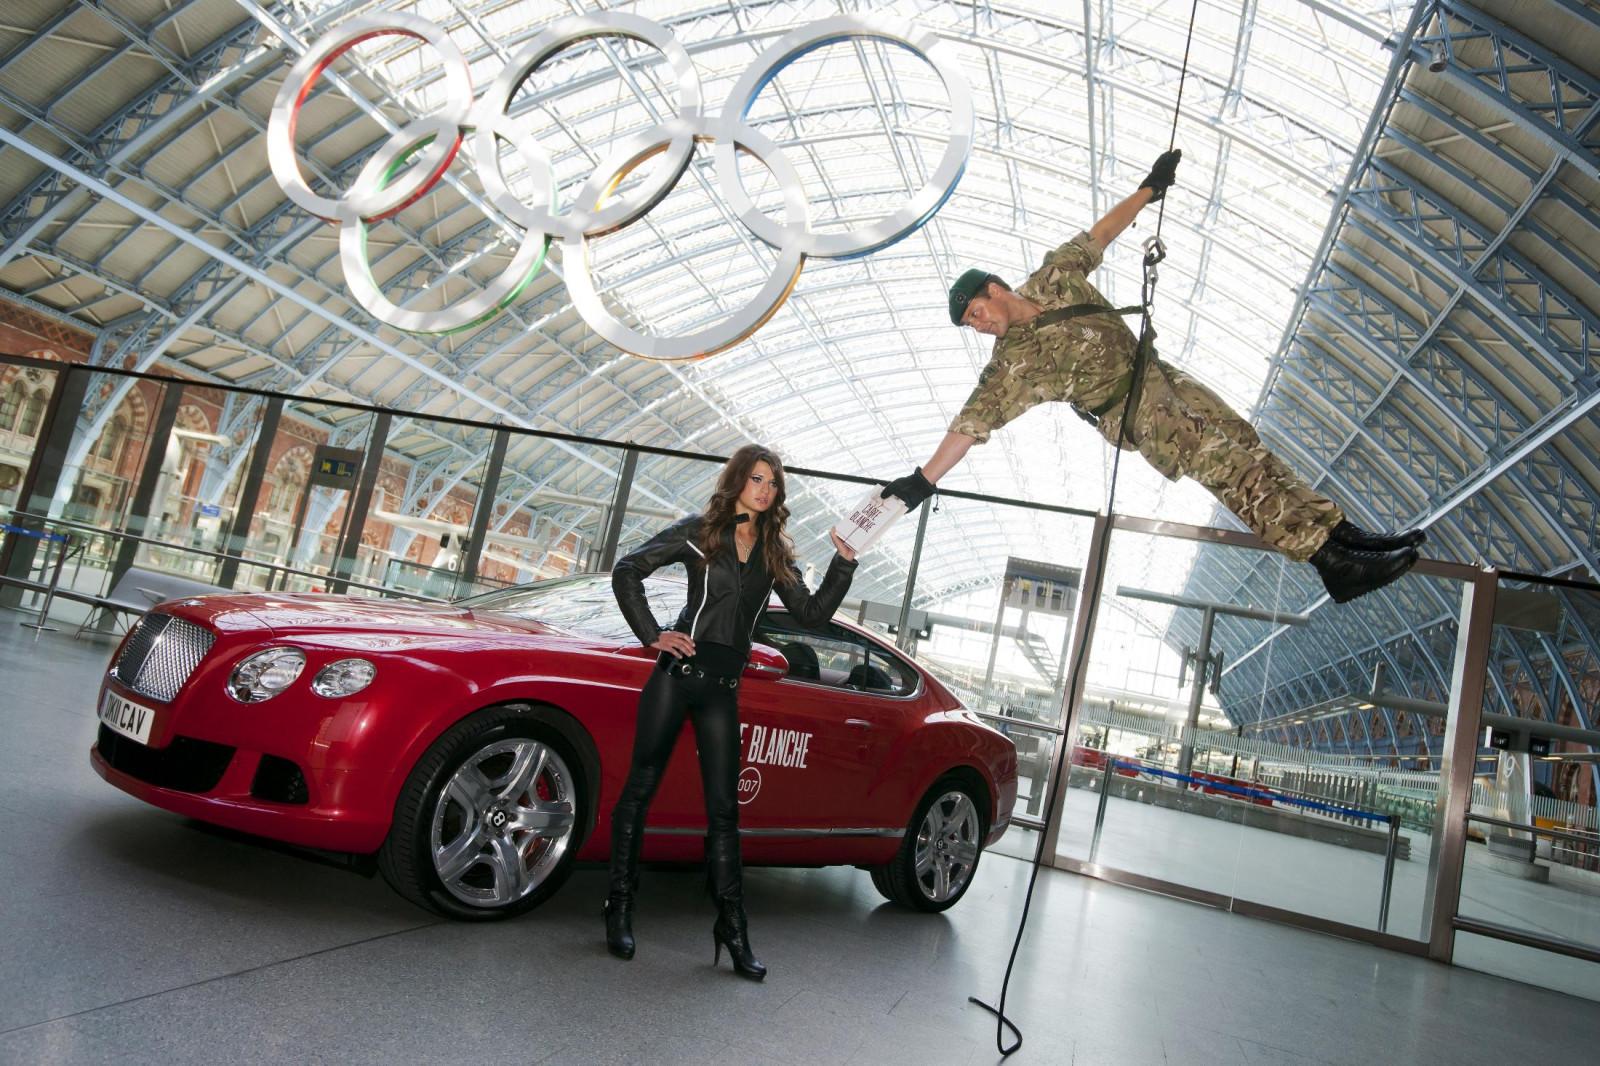 Continental gt bond girl amp commandos at new james bond book launch